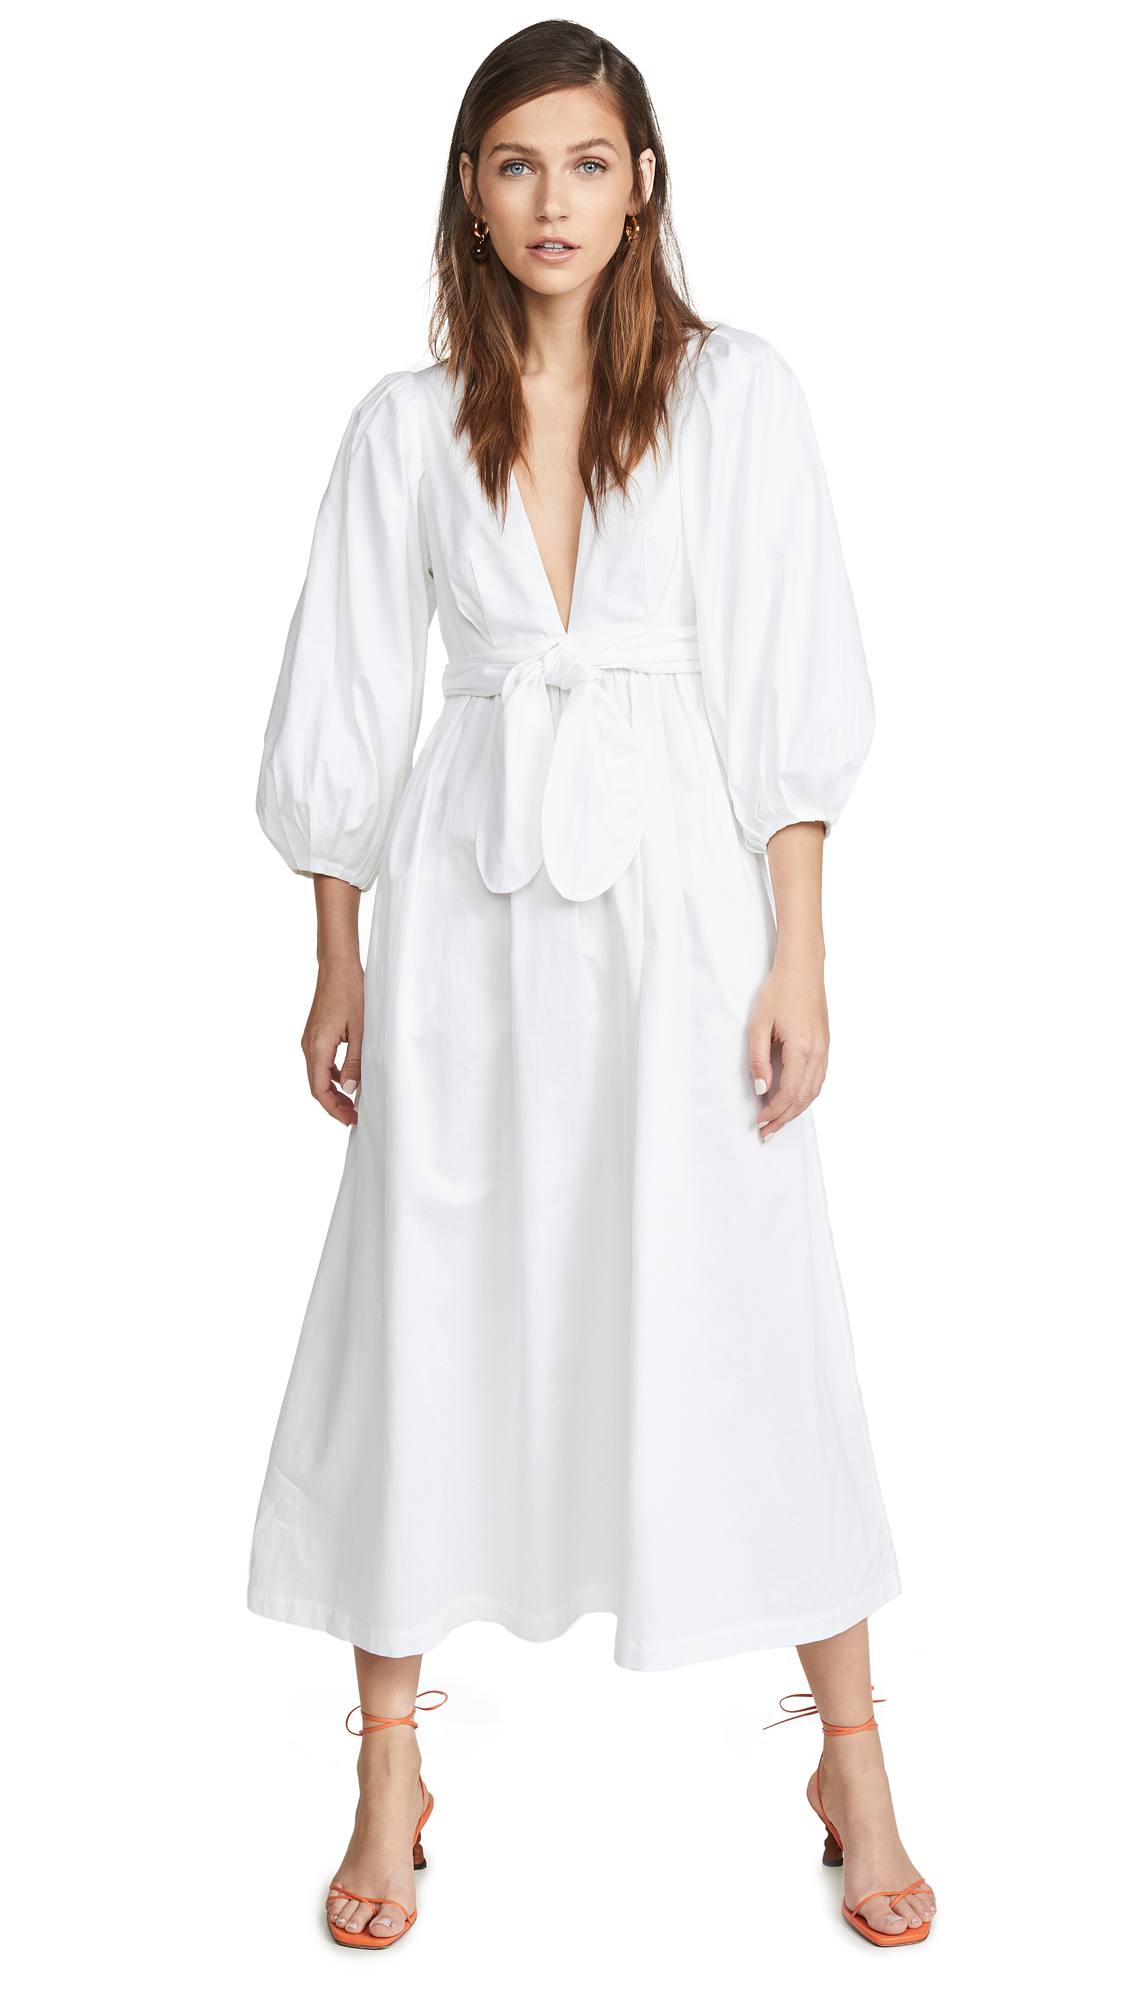 Mara Hoffman Maisie Dress - White